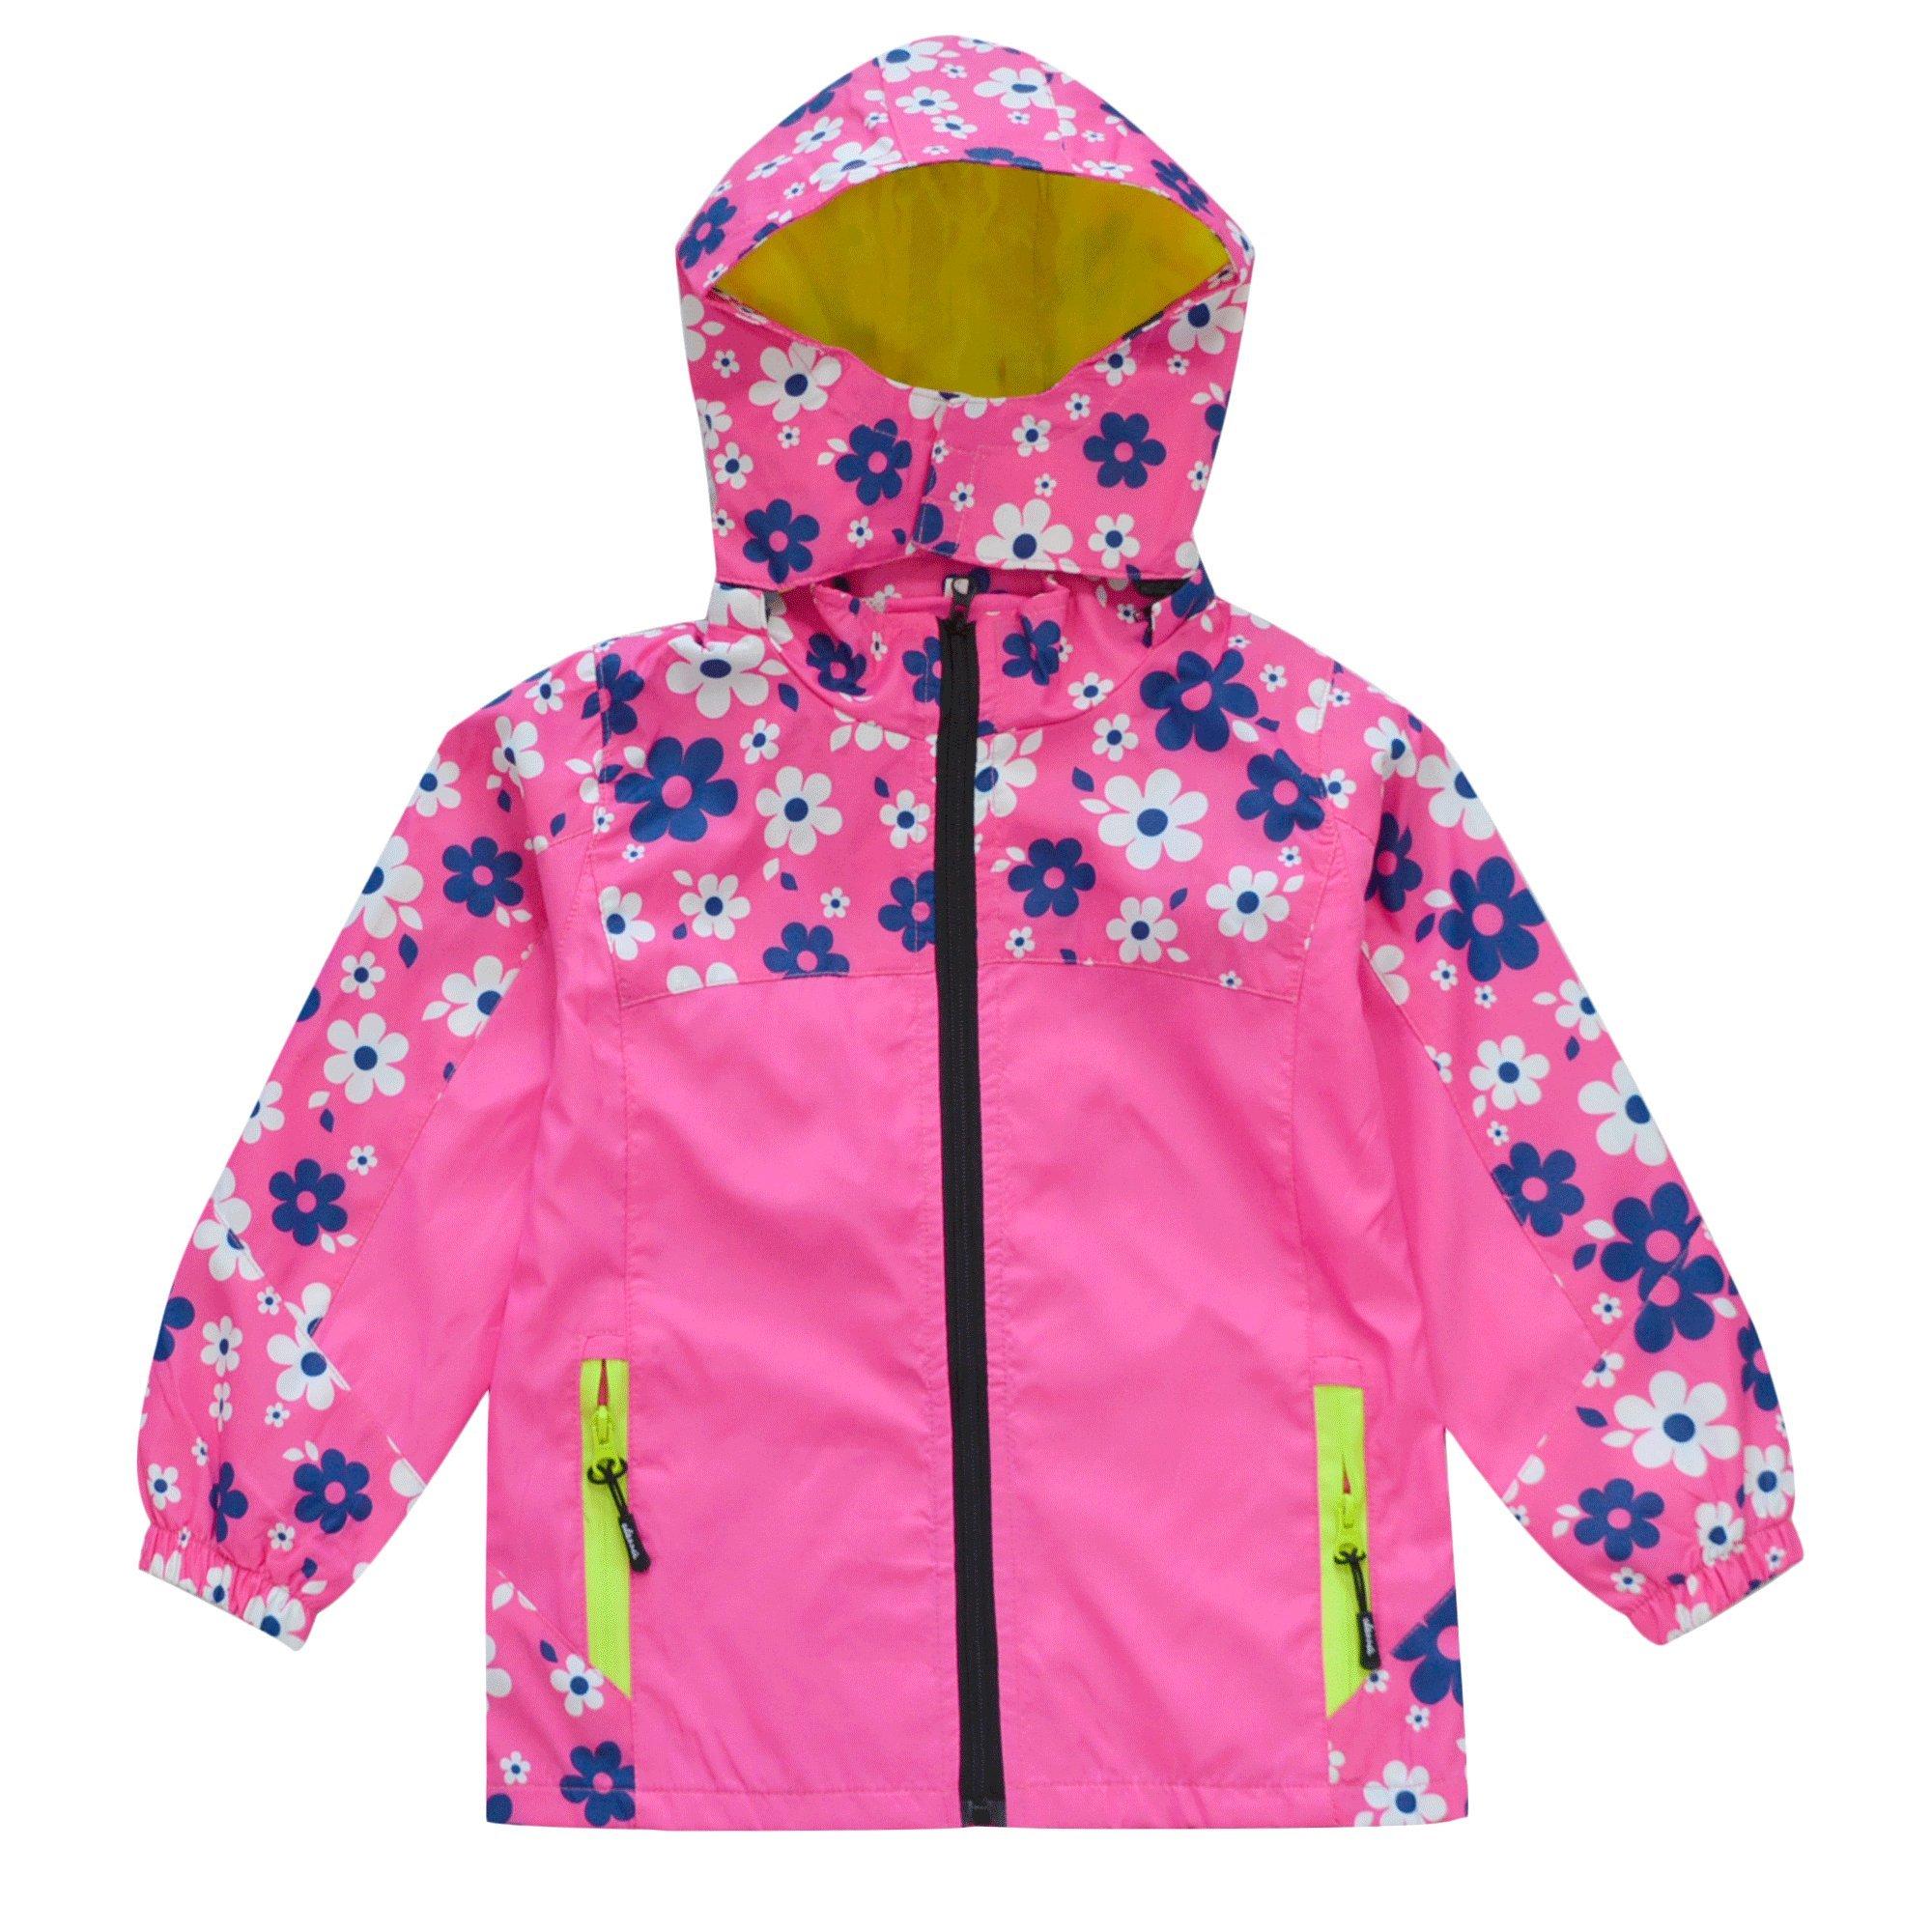 KISBINI Big Girls Windproof Zip Jacket Hooded Windbreaker Raincoat Rose Red 5T